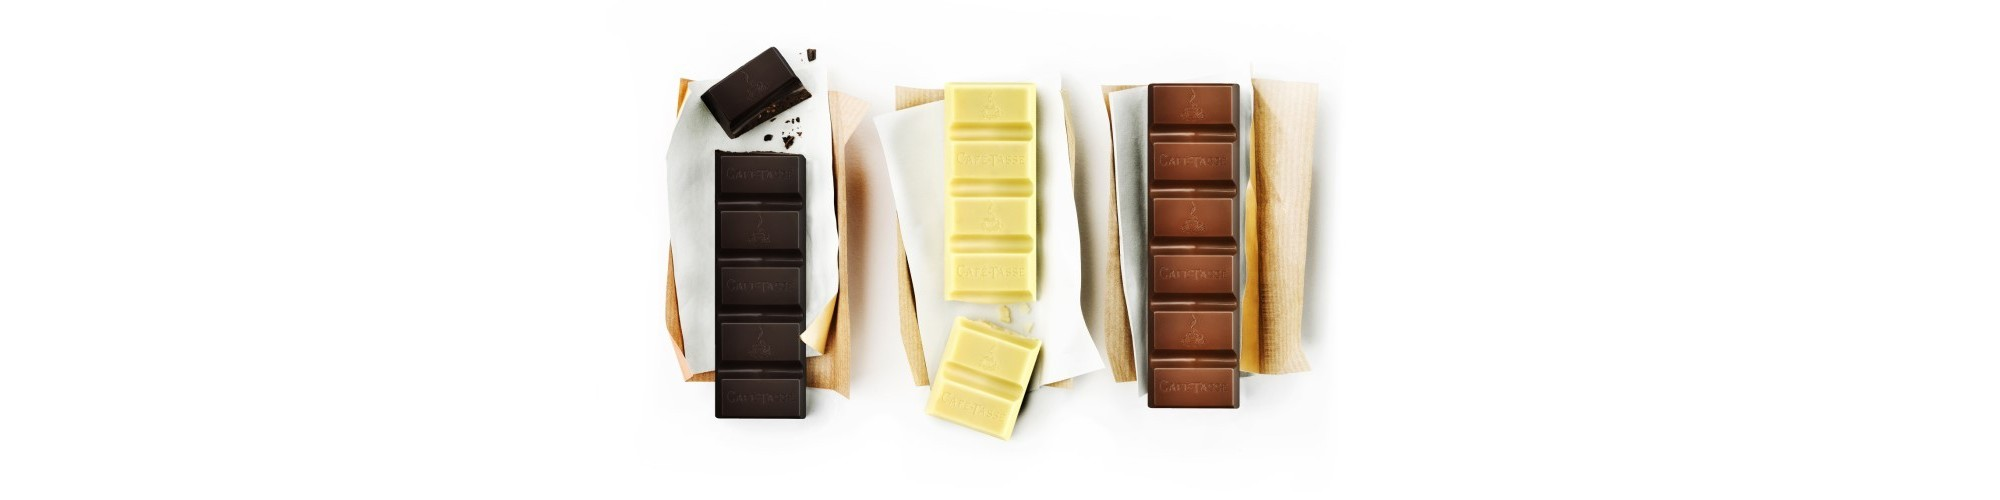 Barres de chocolat (45gr)